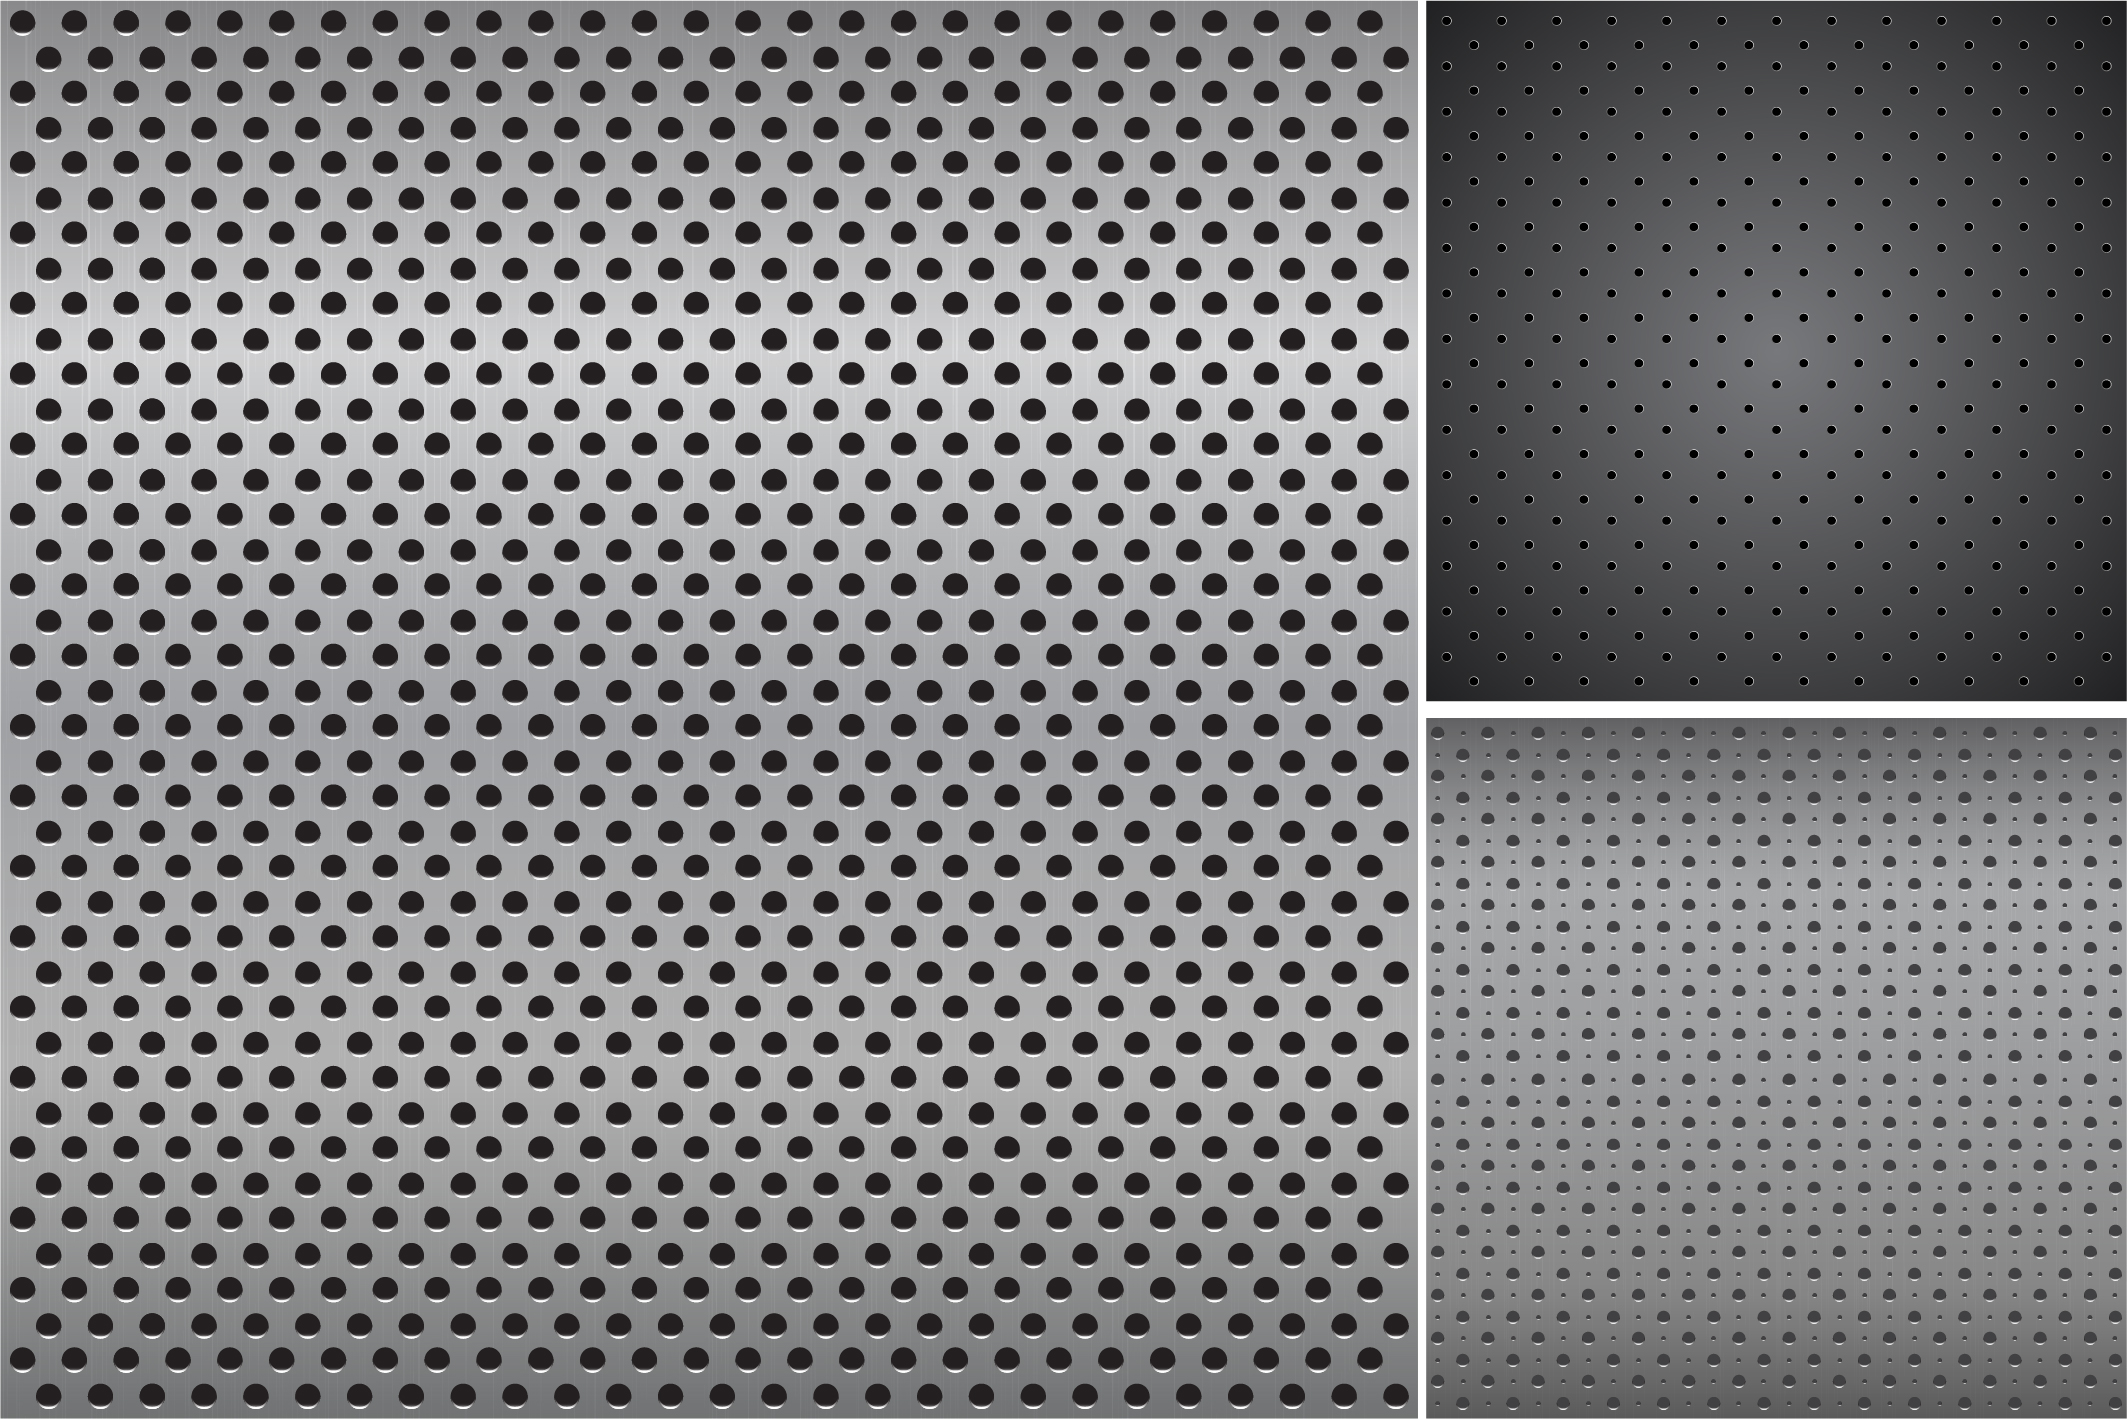 Metallic dark textures with holes. example image 7